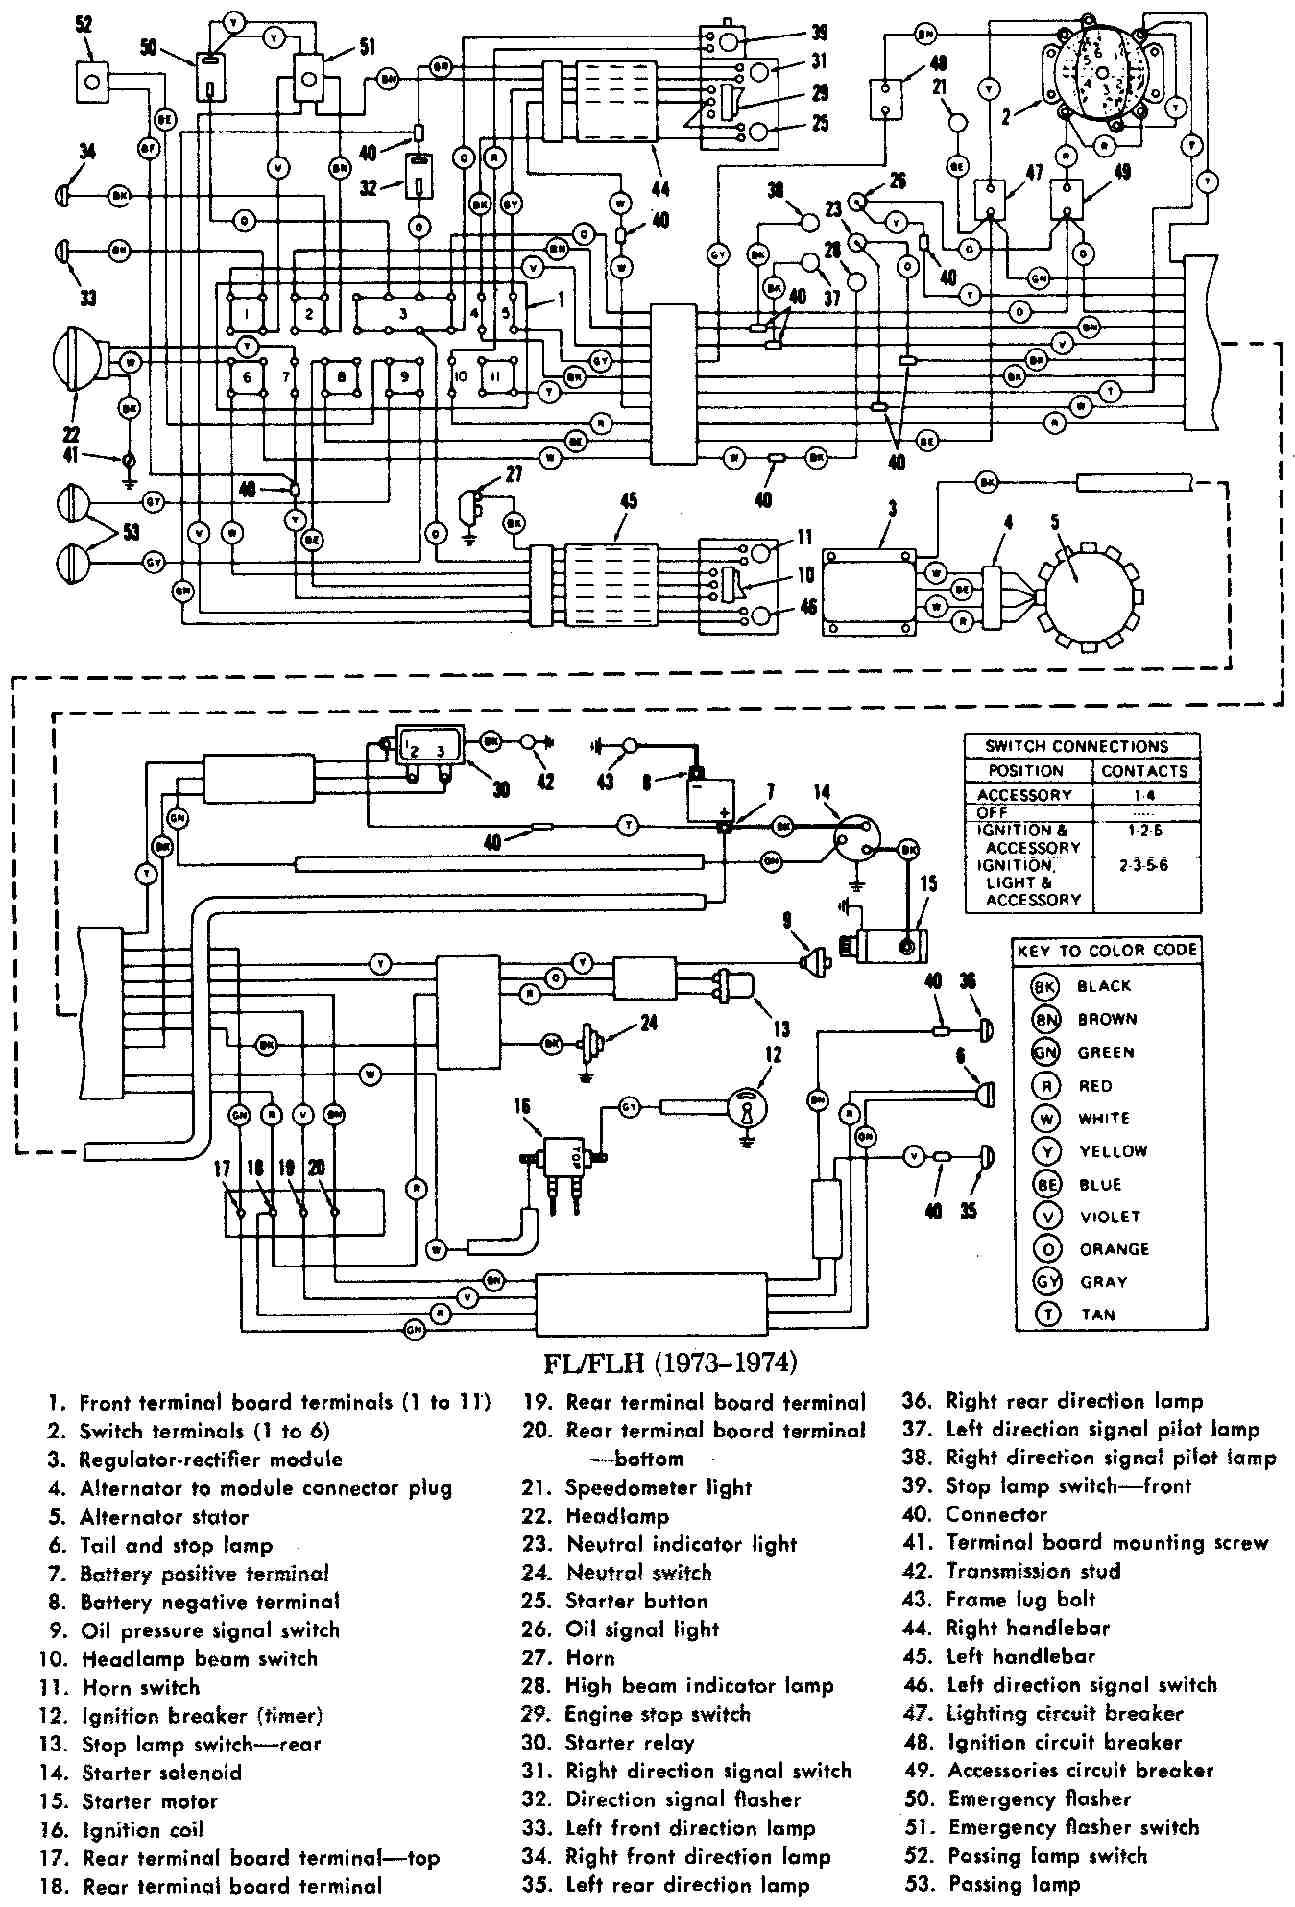 medium resolution of 1972 harley davidson wiring diagram wiring diagram third level 1974 harley davidson golf cart wiring diagram